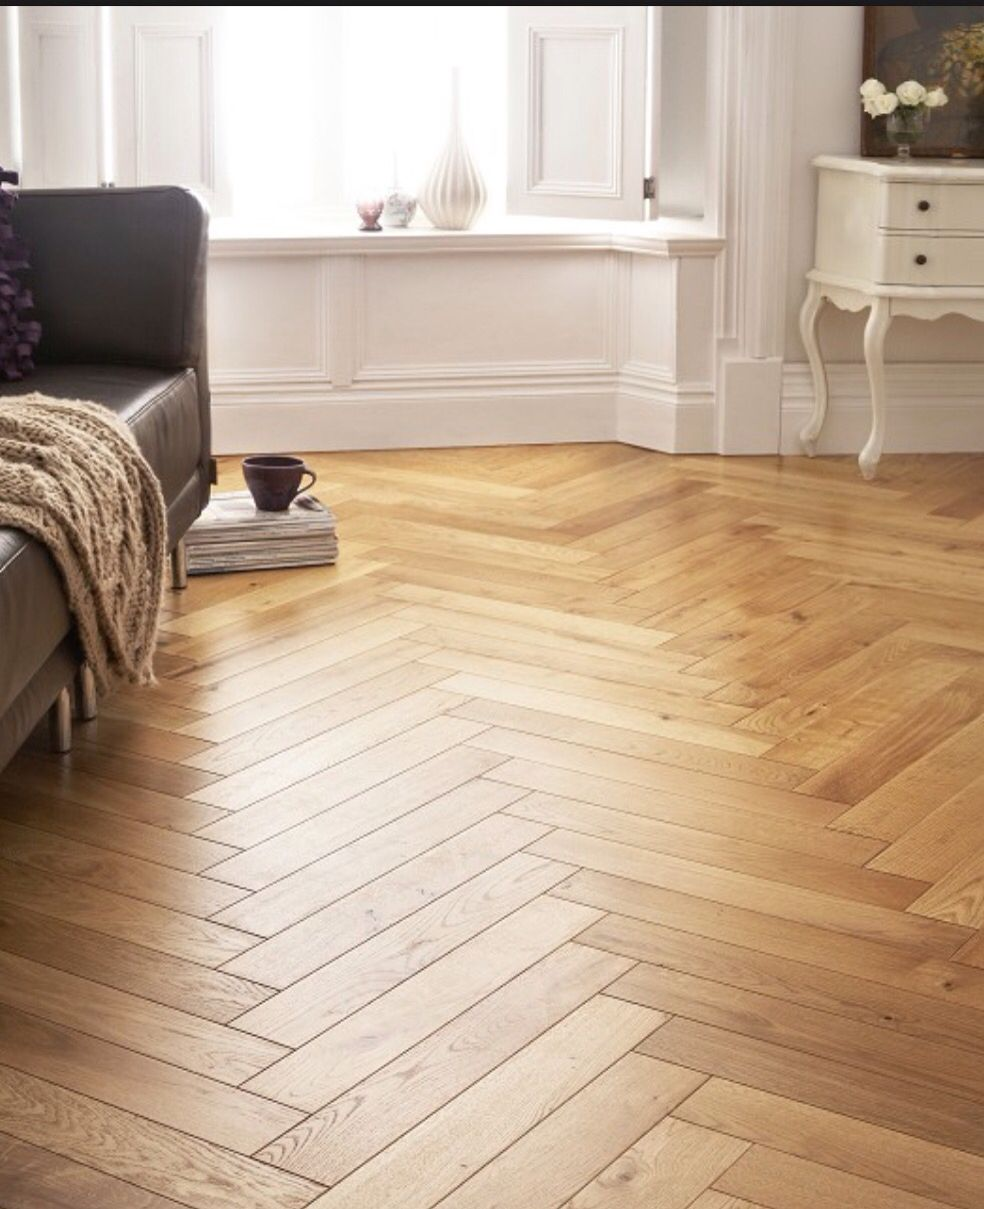 Alessano Herringbone oak effect Laminate flooring 1.39 m²